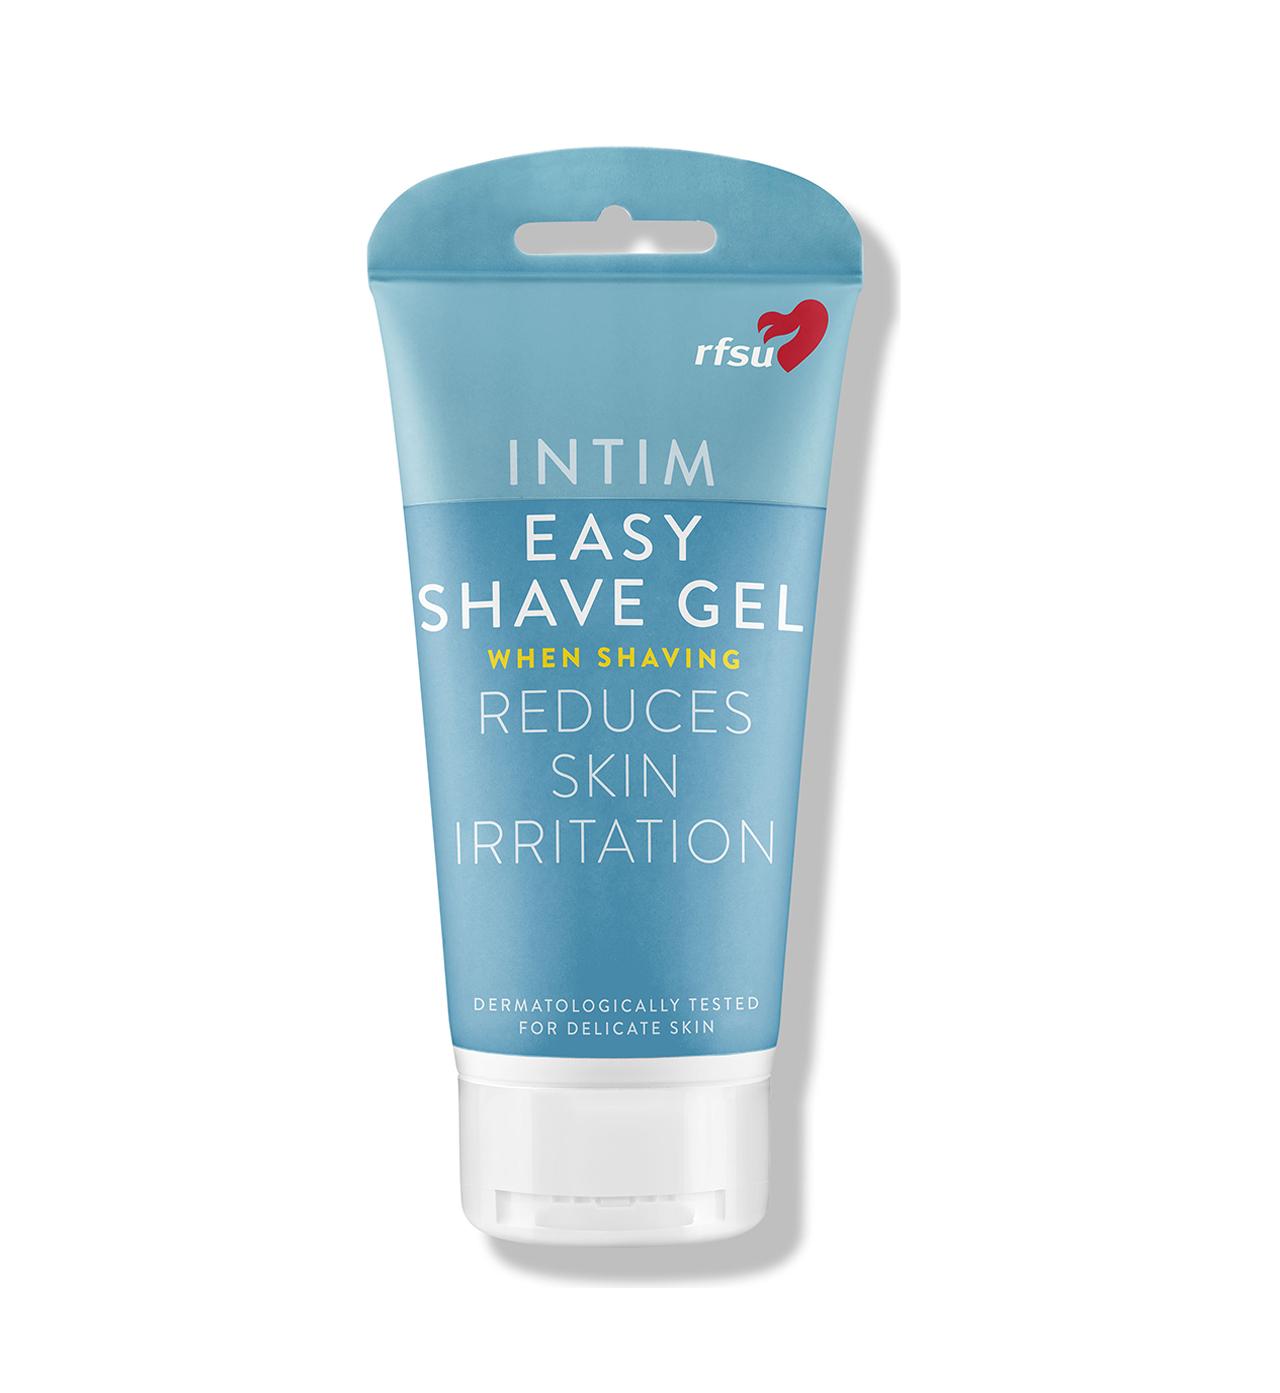 rfsu easy shave gel